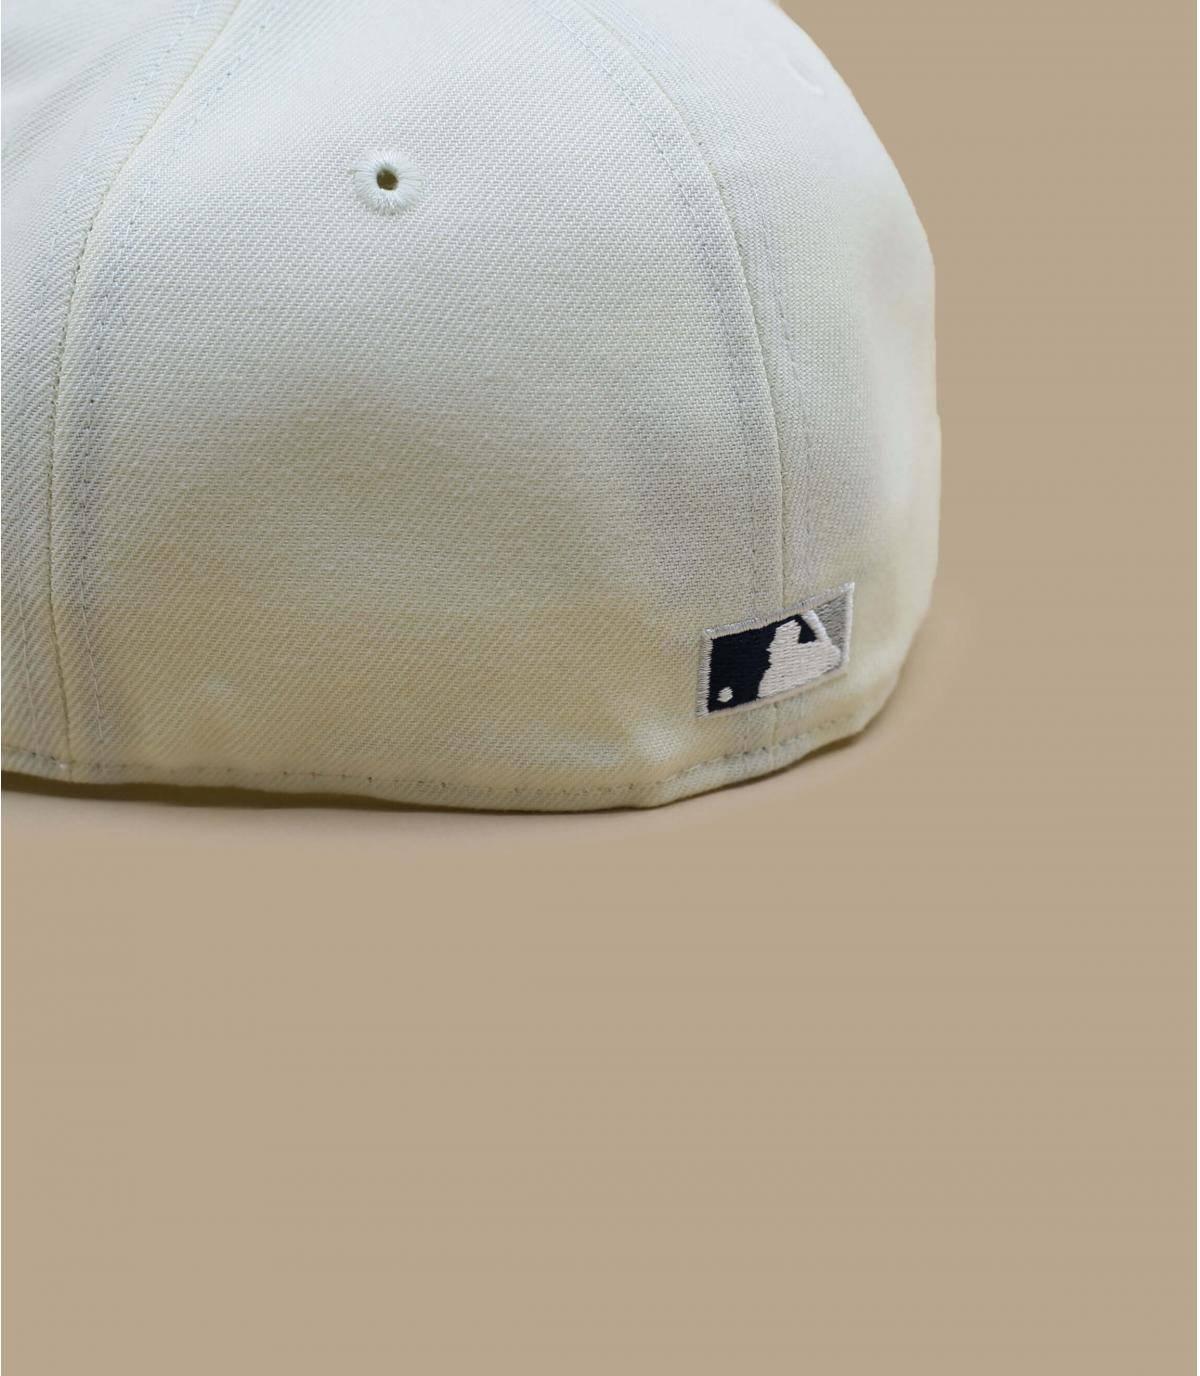 Dettagli 5950 NY 1996 World Series - image 4